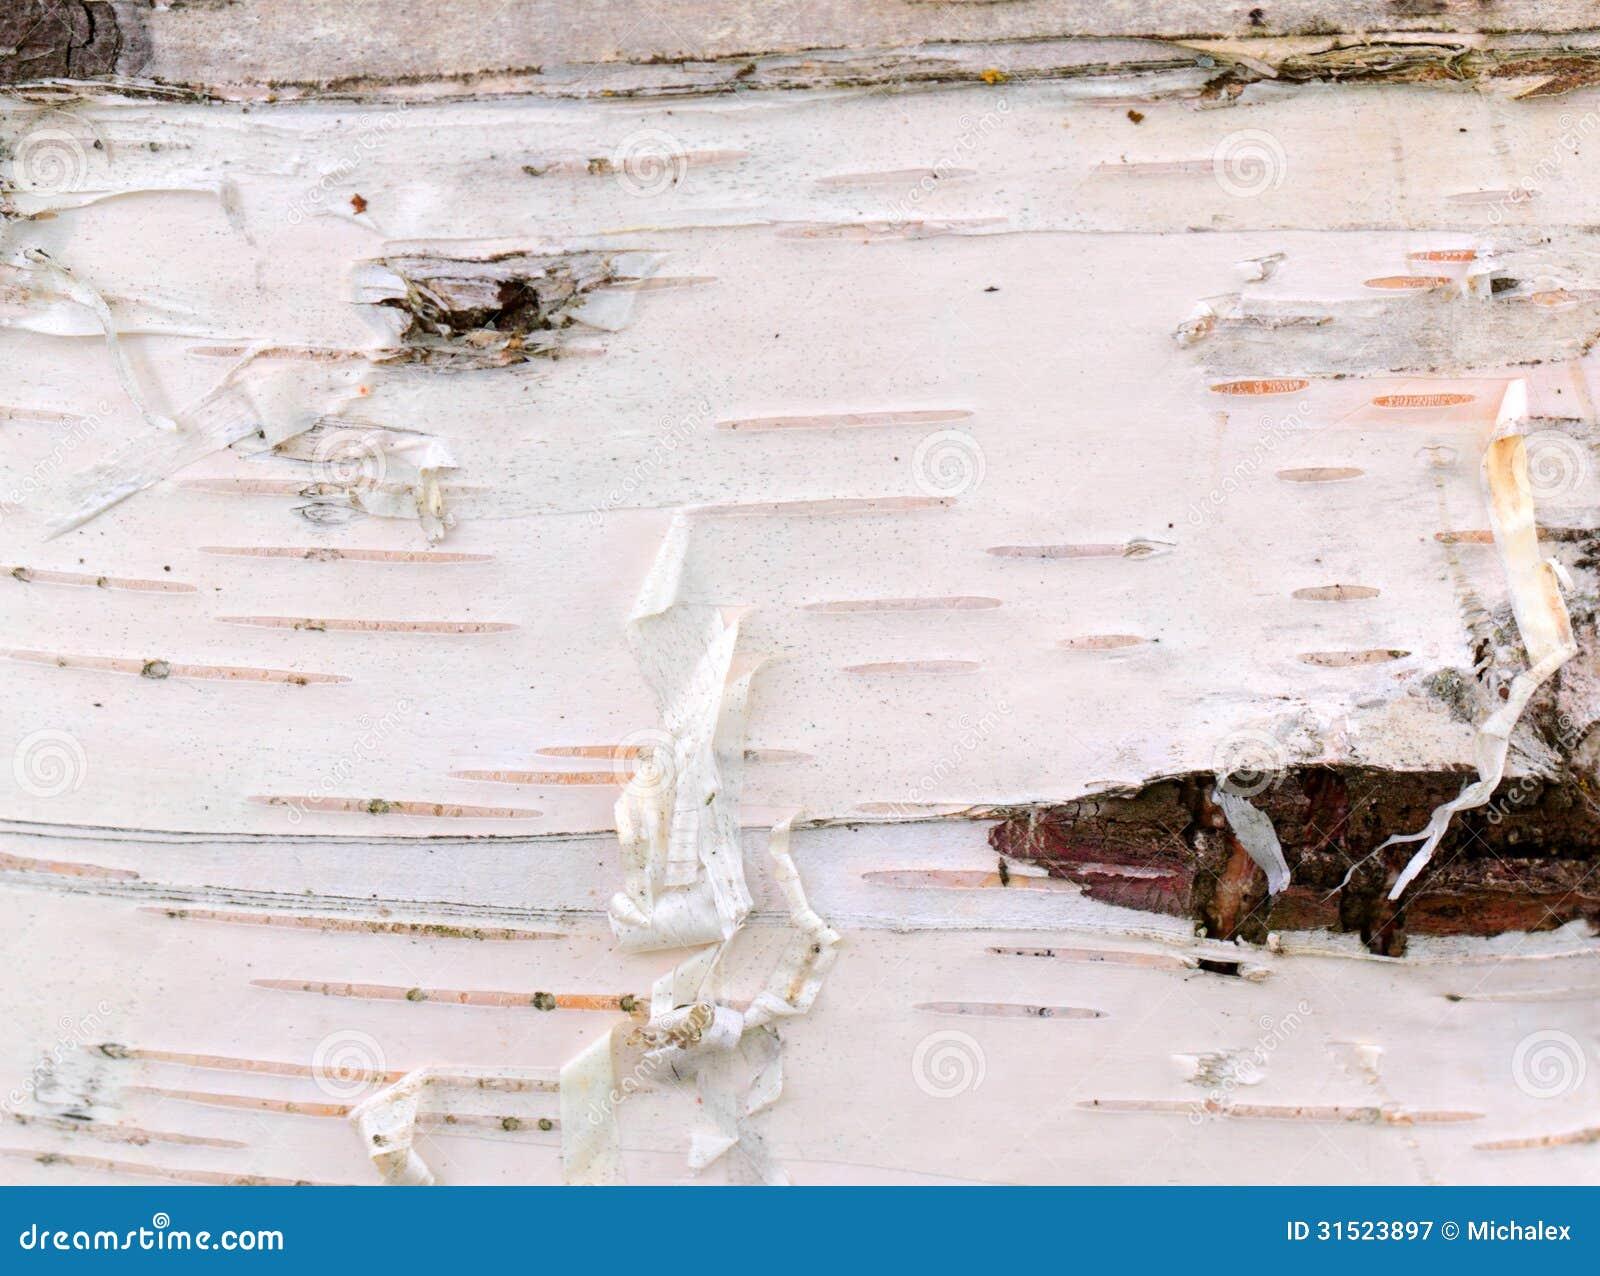 white birch bark stock image  image of bark  wood  peel